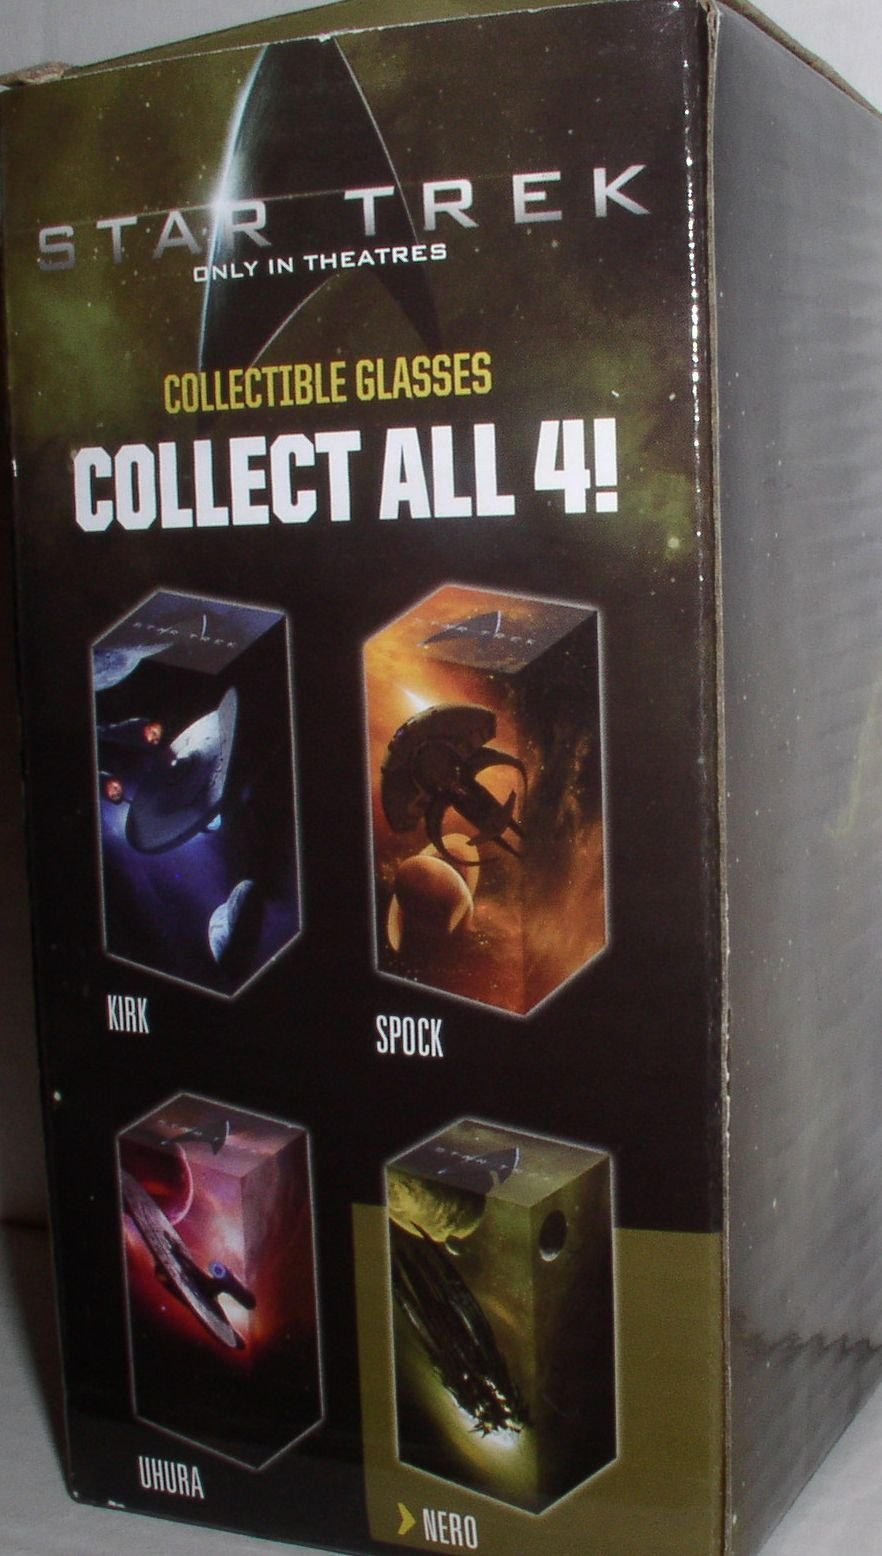 STAR TREK COLLECTIBLE GLASS ''NERO''